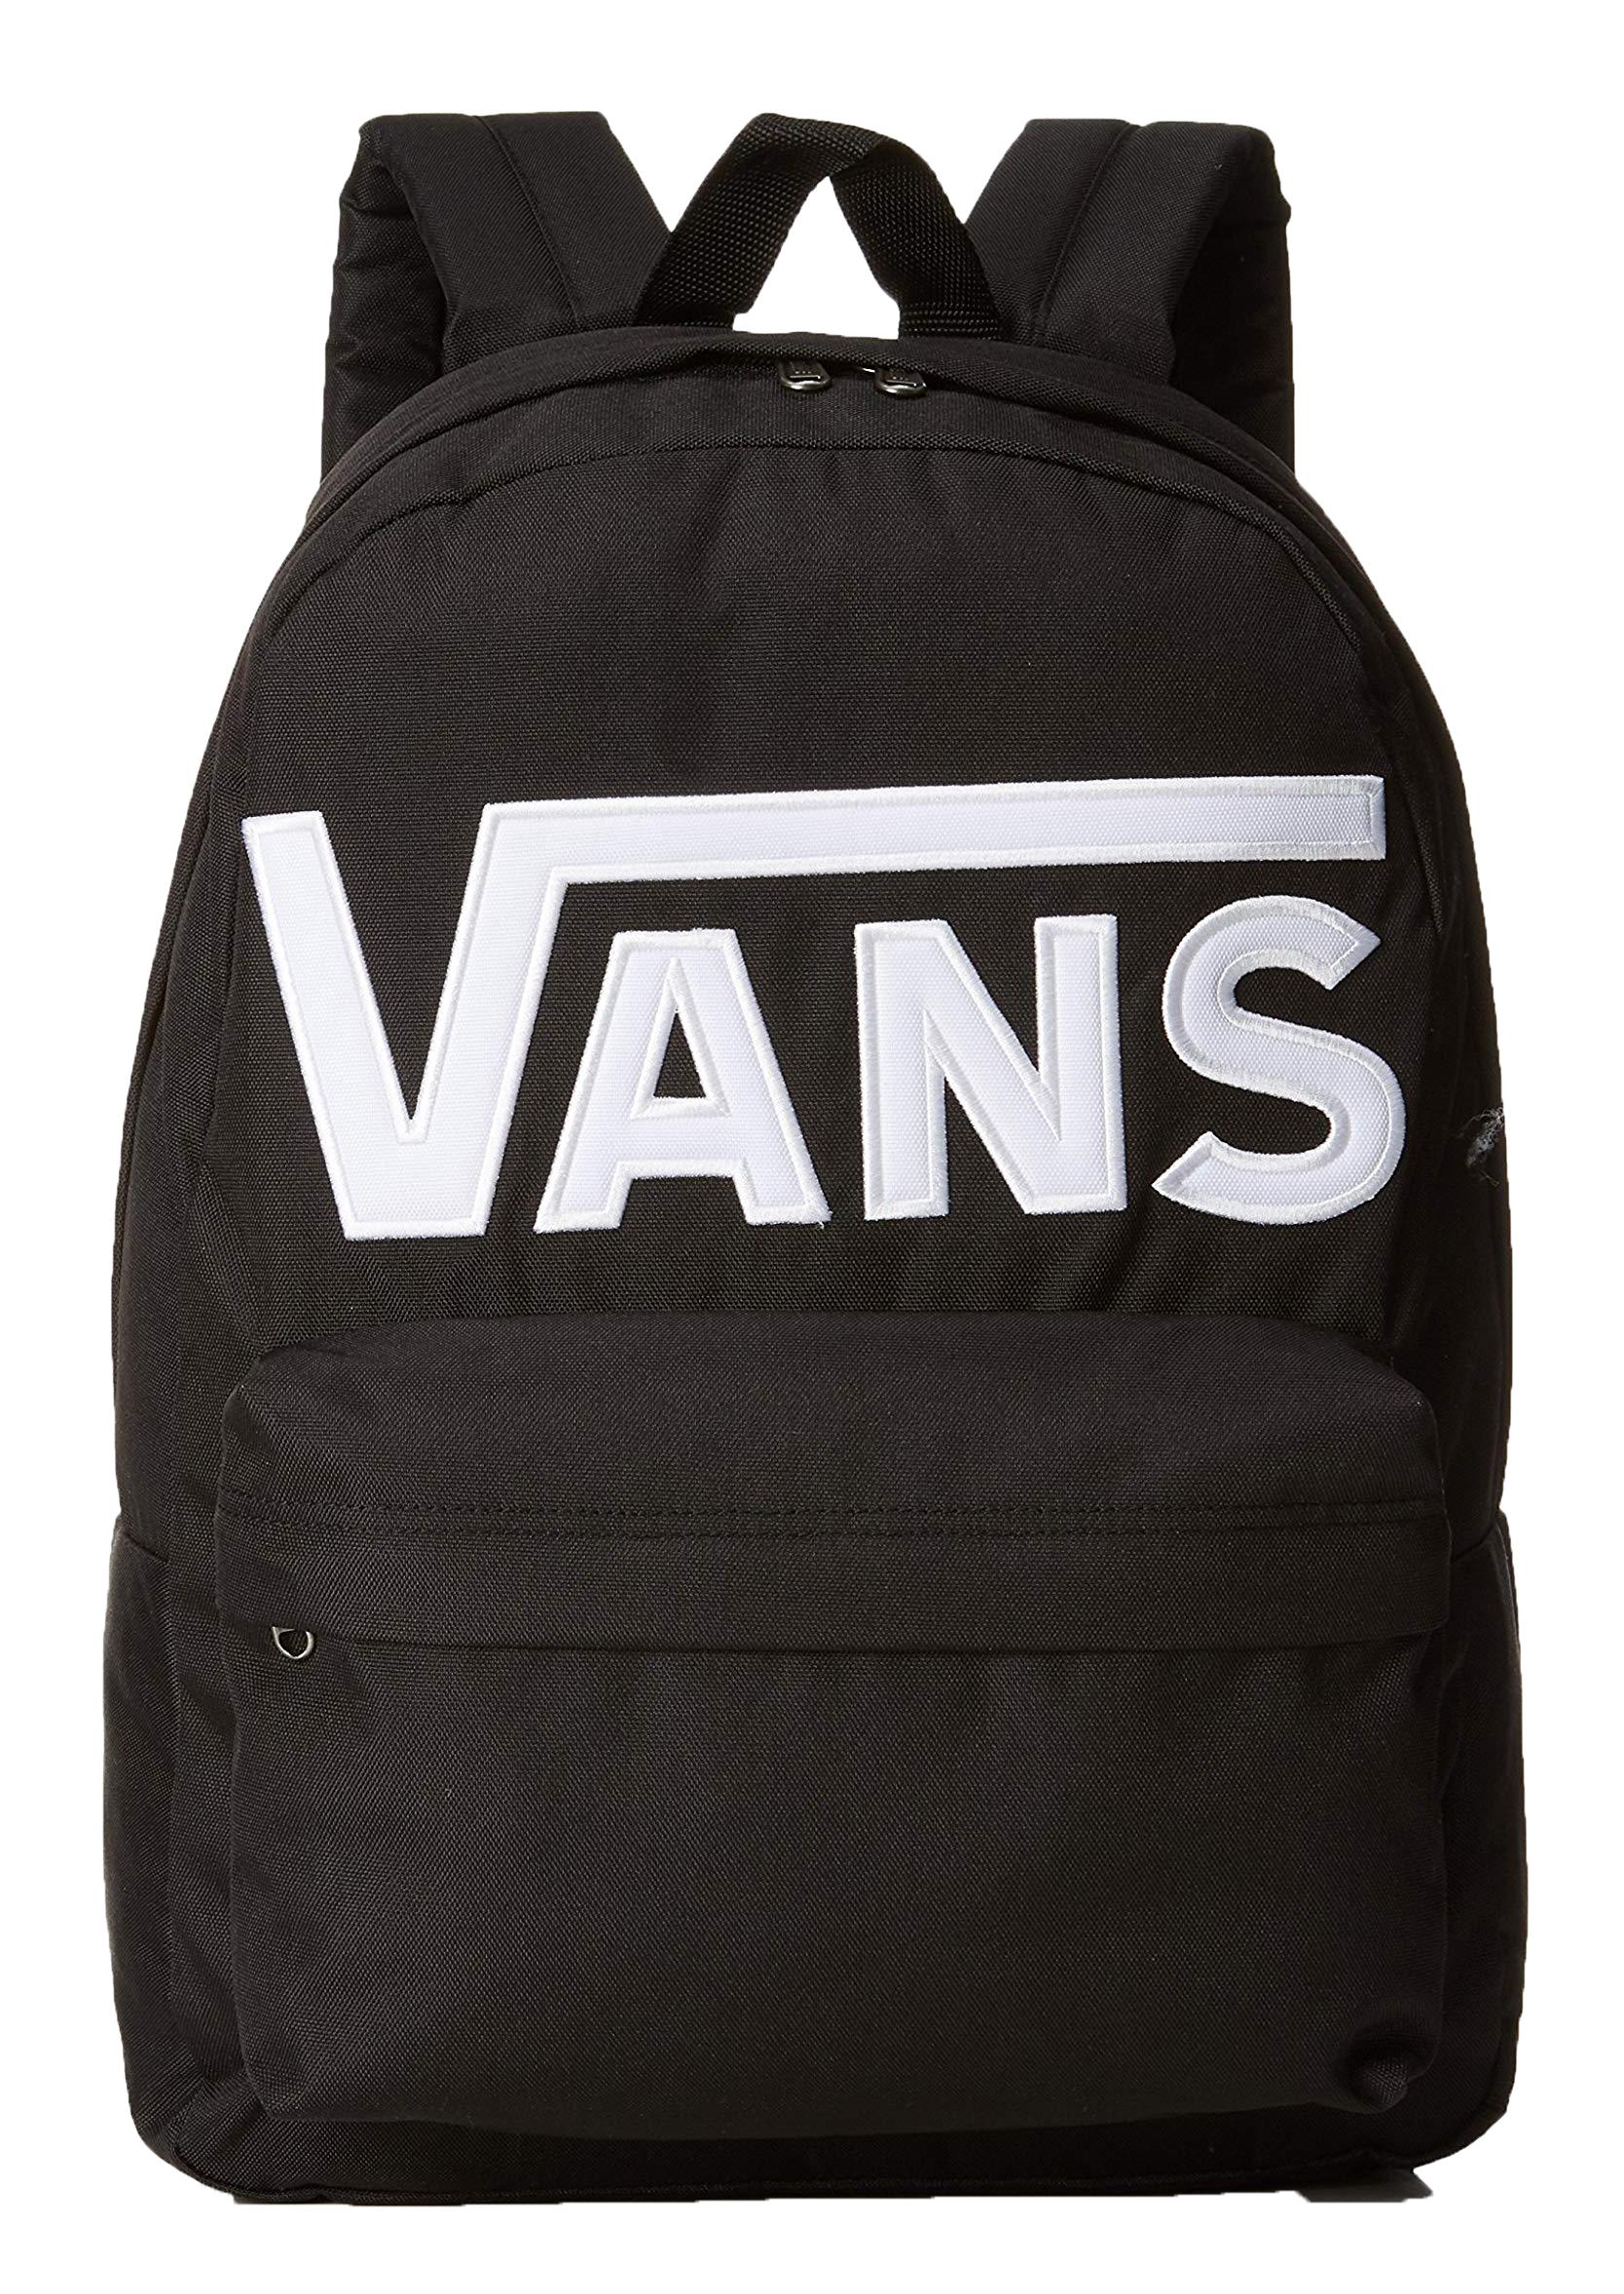 bbc3a9fe1486d Click on the Image to Enlarge. More Details. VANS Old Skool II backpack ...